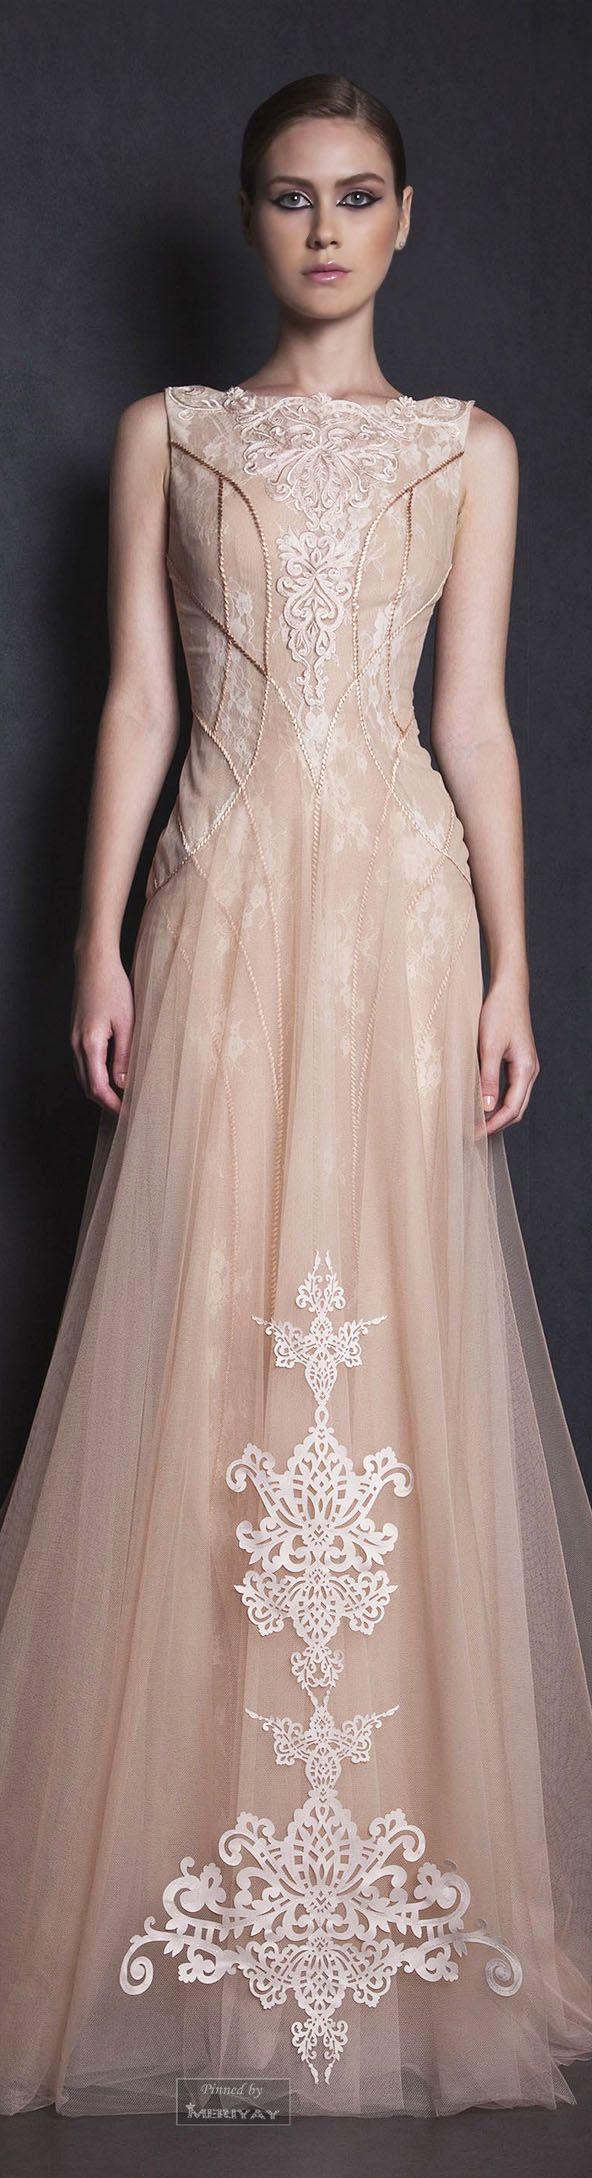 Fustana 2015 modele te fustanave 2015 dresses 2015 fustana modele te - Tony Ward Spring Summer 2015